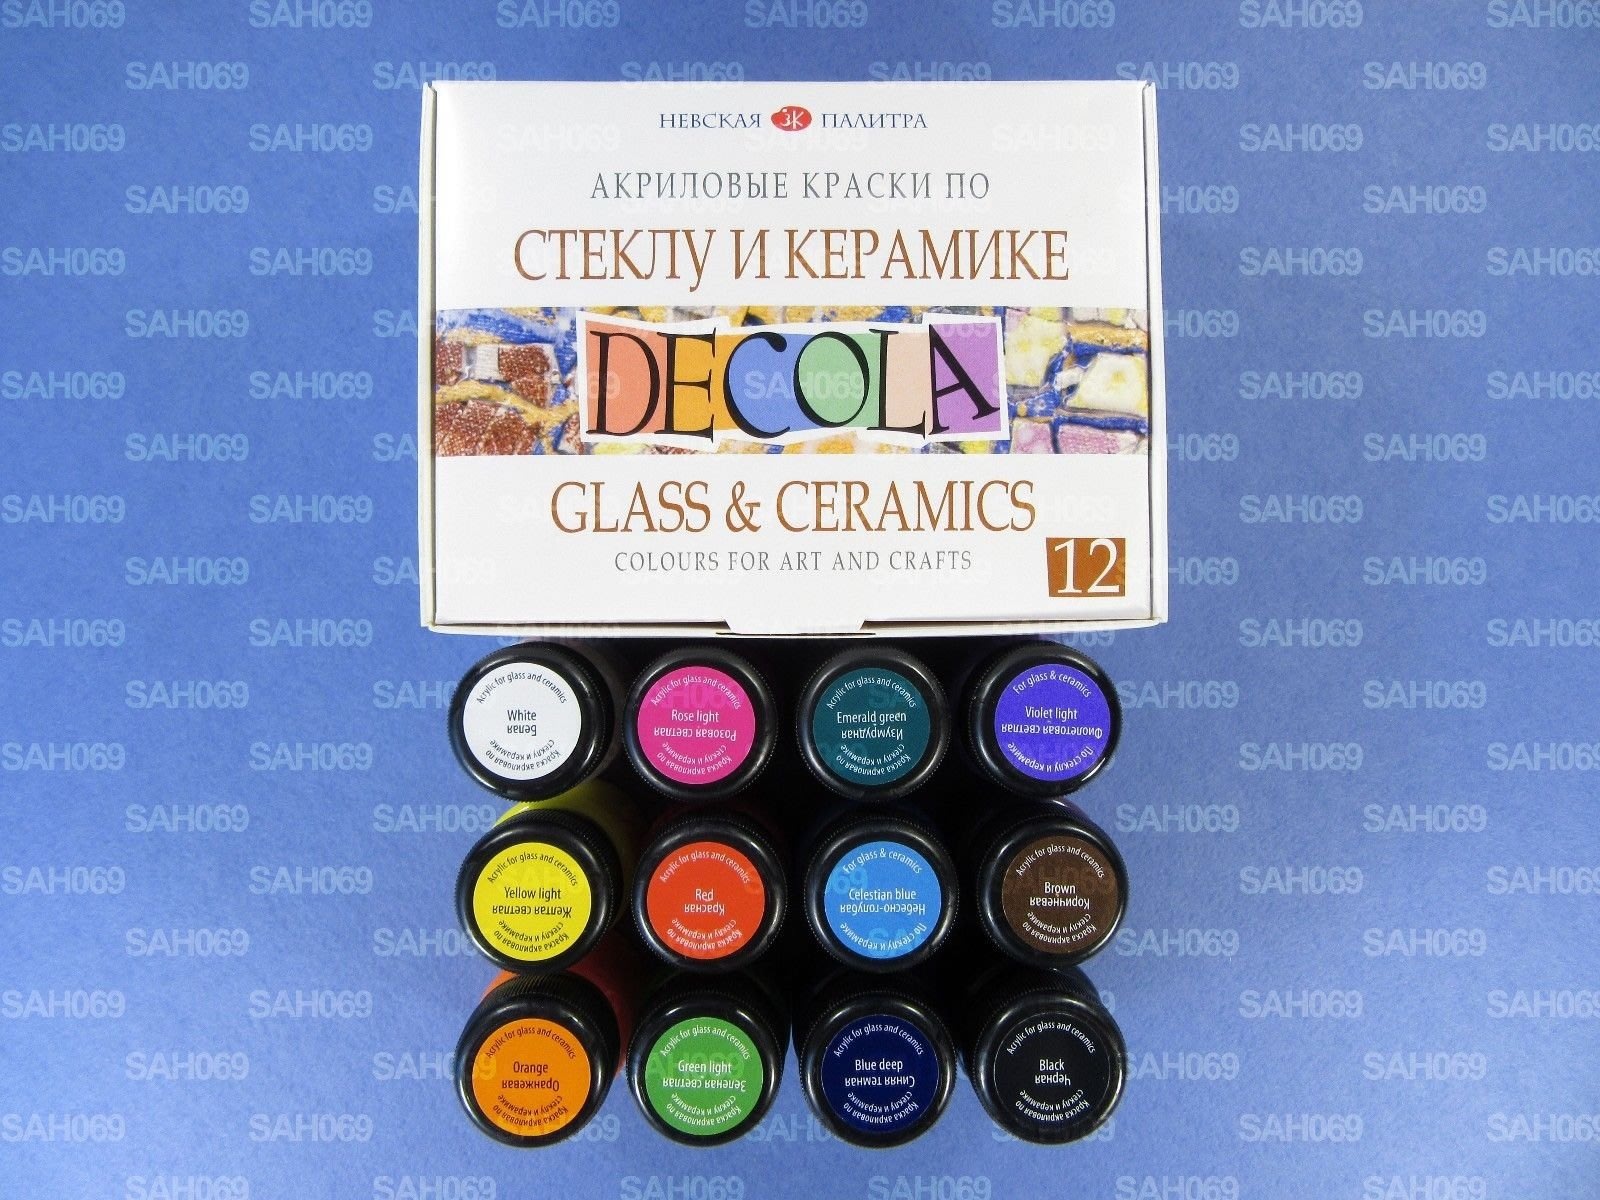 H&G美術廣場 俄羅斯 JSC Nevskaya palitra 3k Decola玻璃陶瓷顏料20ml12色盒裝